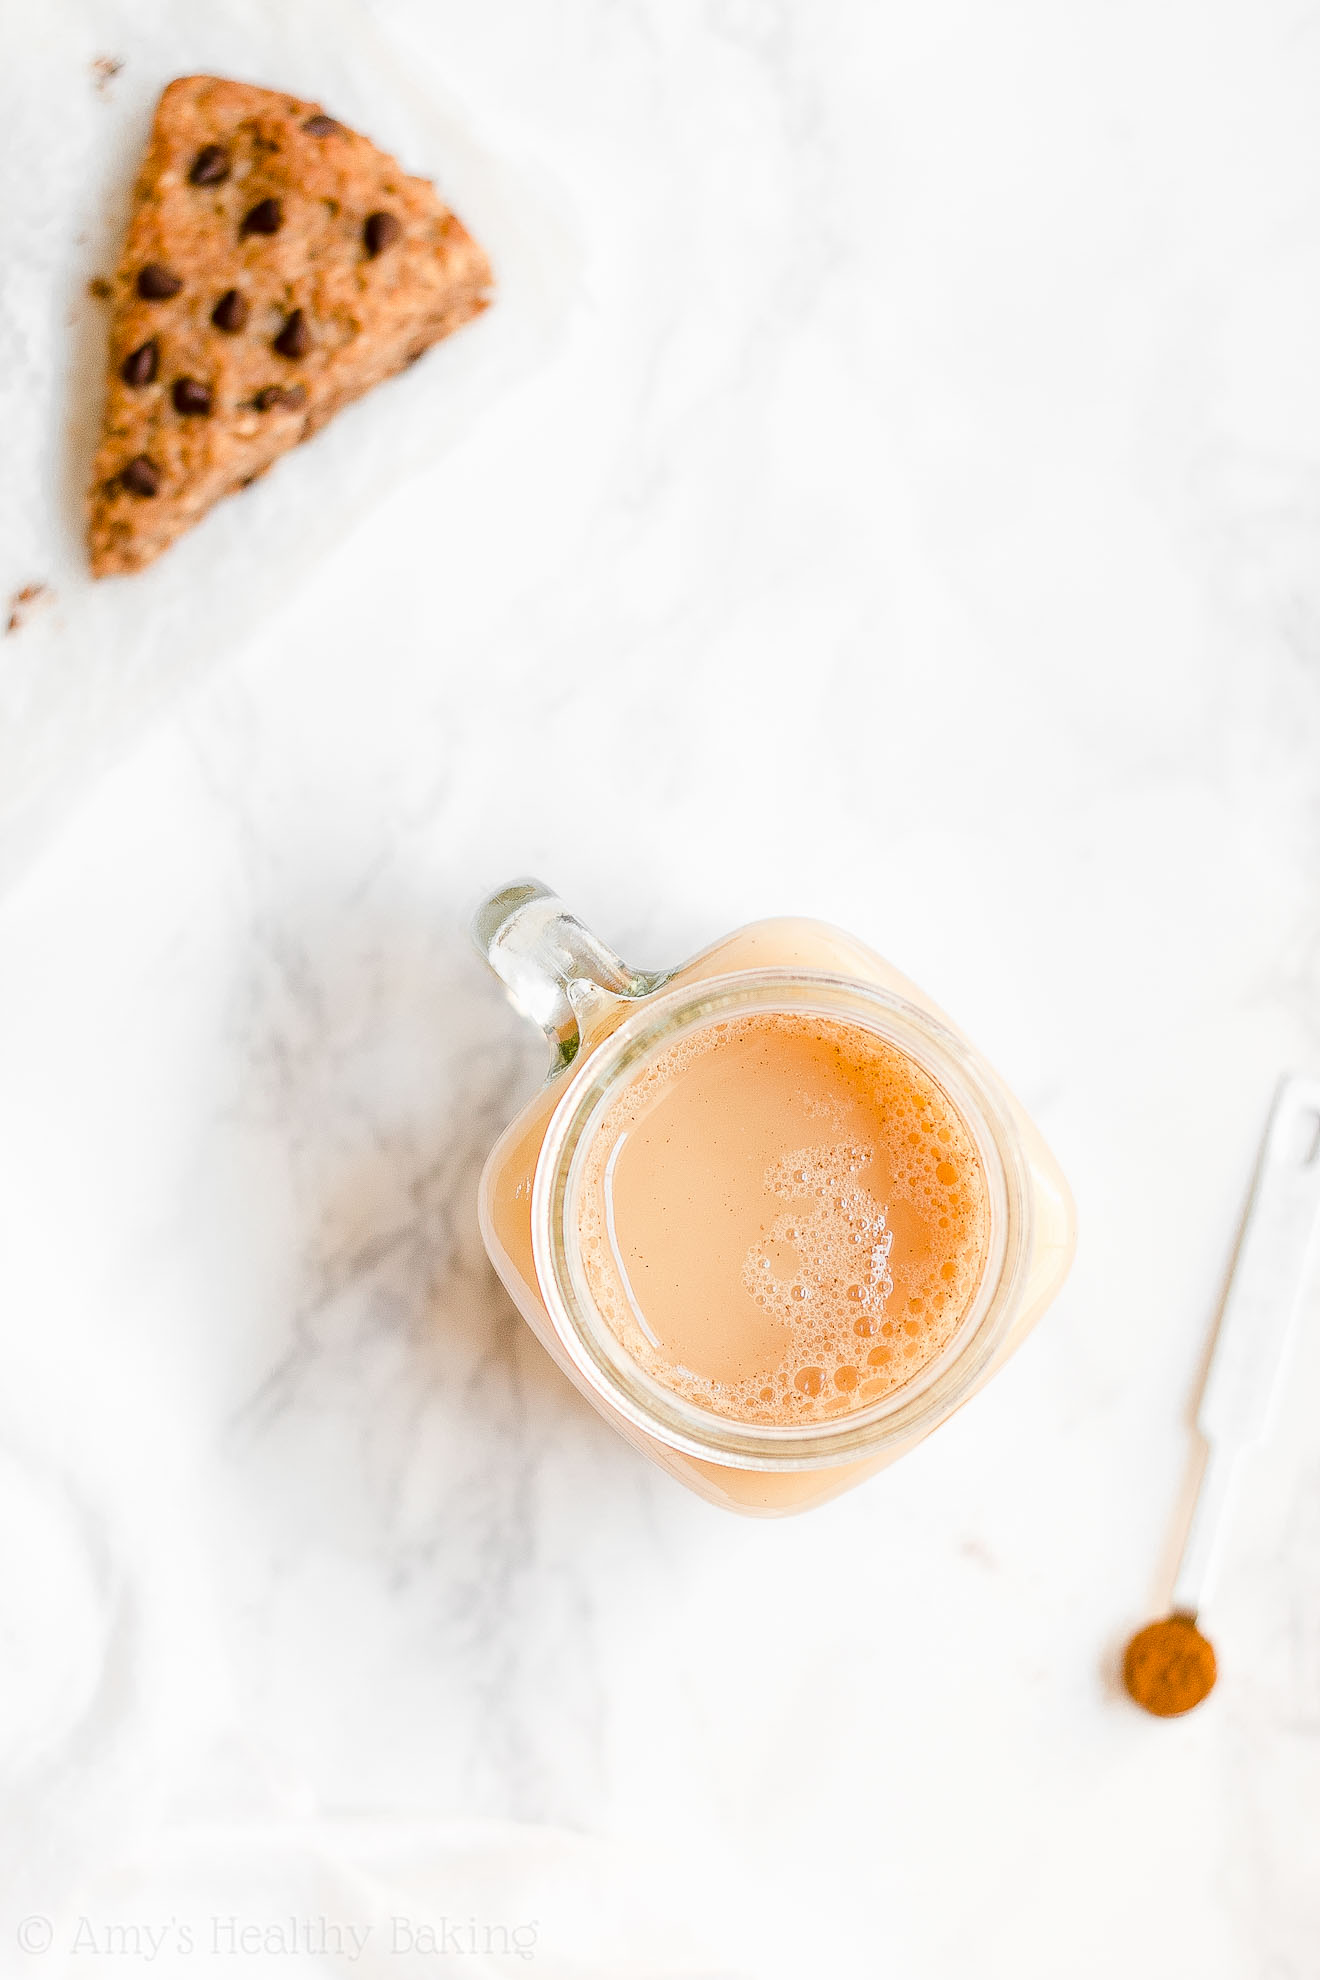 Healthy Clean Eating Almond Milk Pumpkin Spice Chai Latte